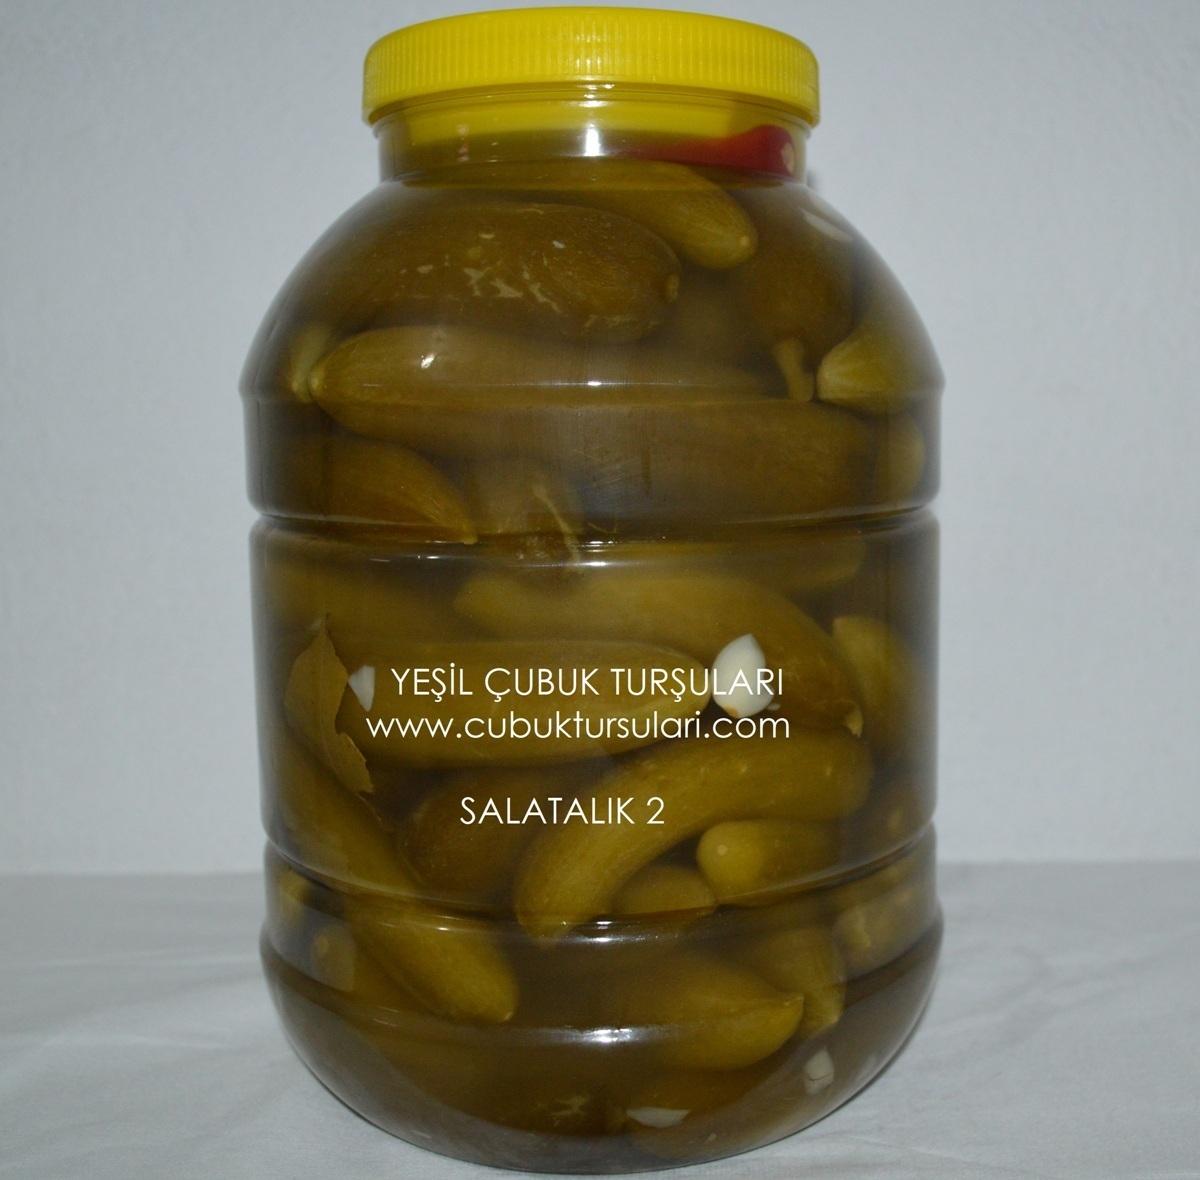 cubuk salatalik tursusu 2 Numara 5 kg